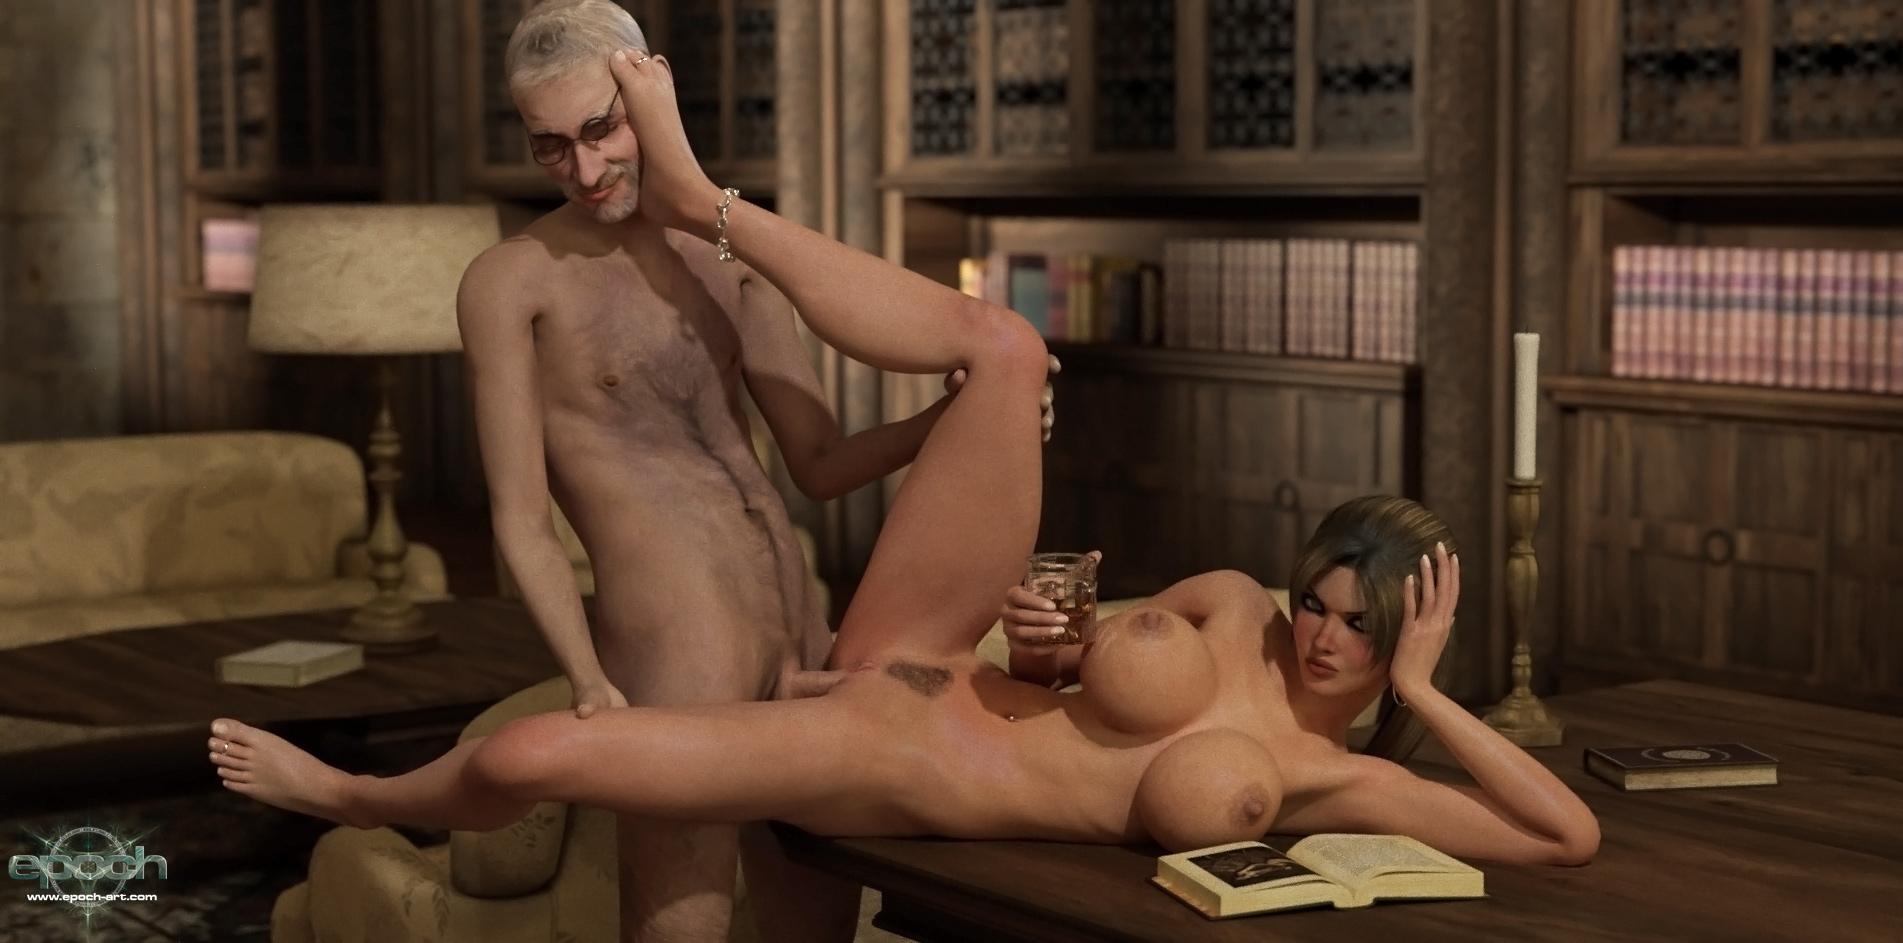 3d арт порно картинки фото